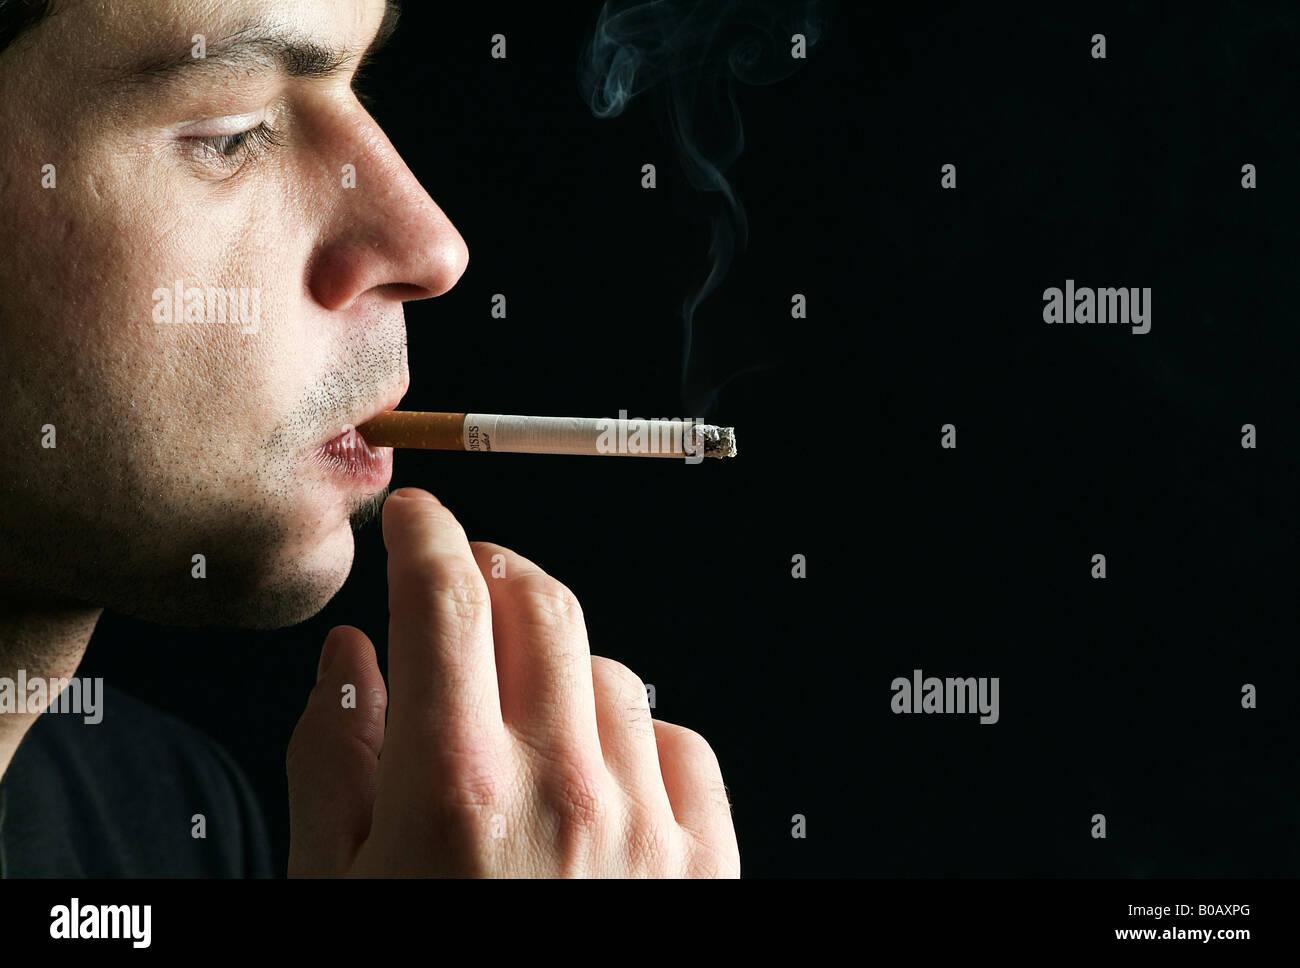 Man smoking a cigarette - Stock Image